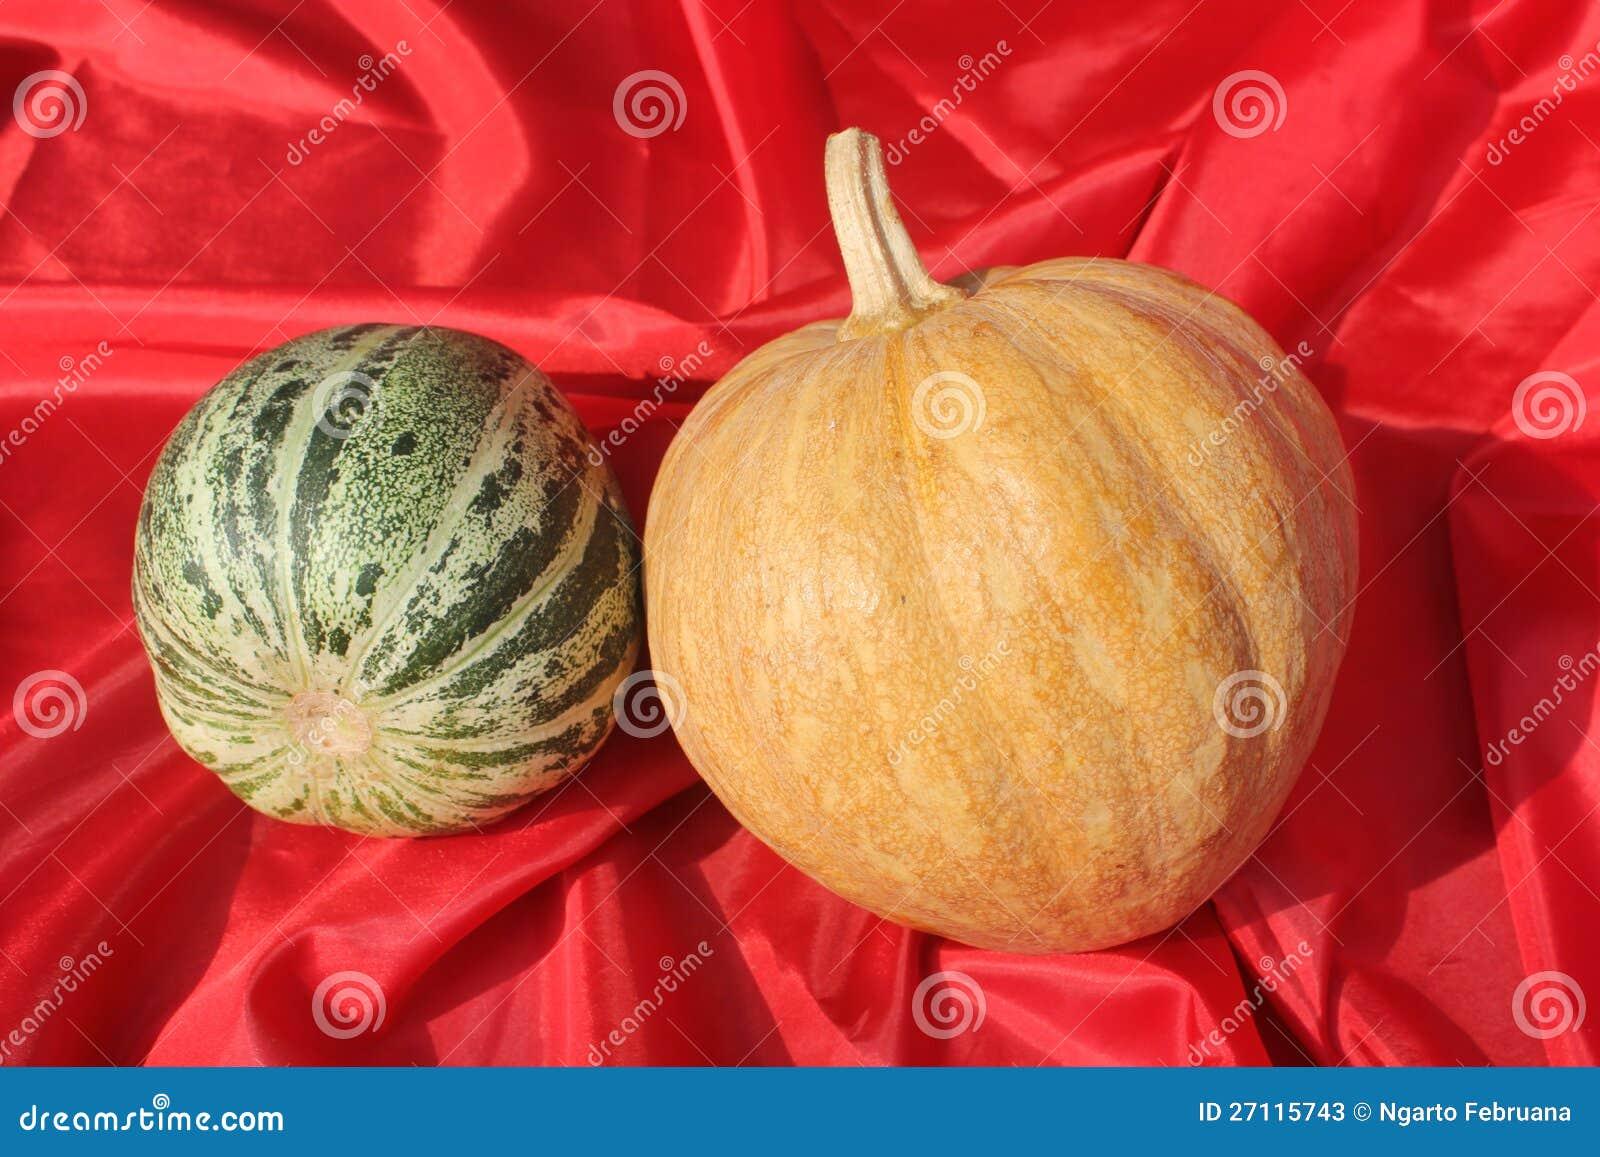 Potiron et cantaloup